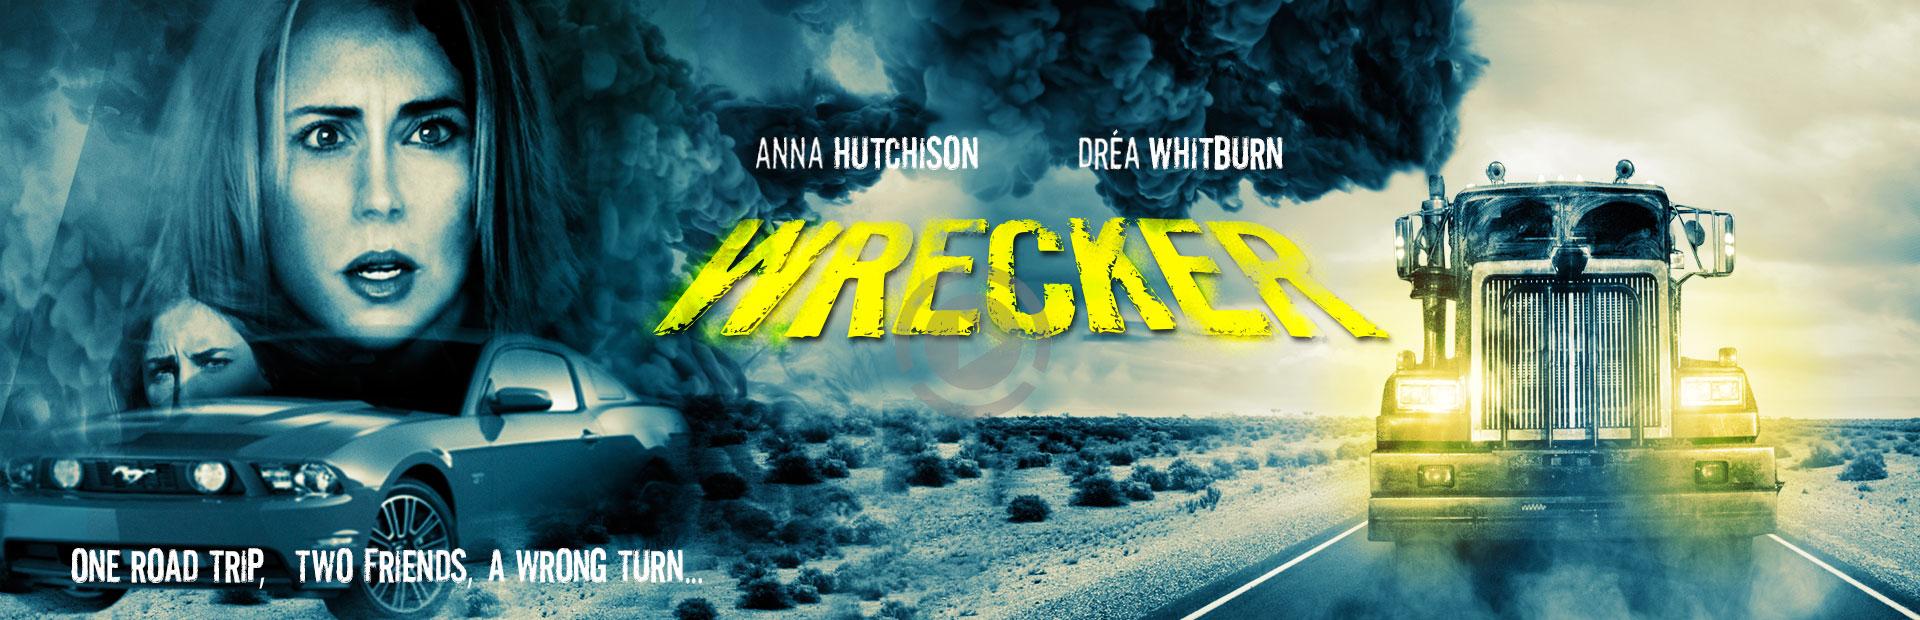 wreckerplay-easycinema